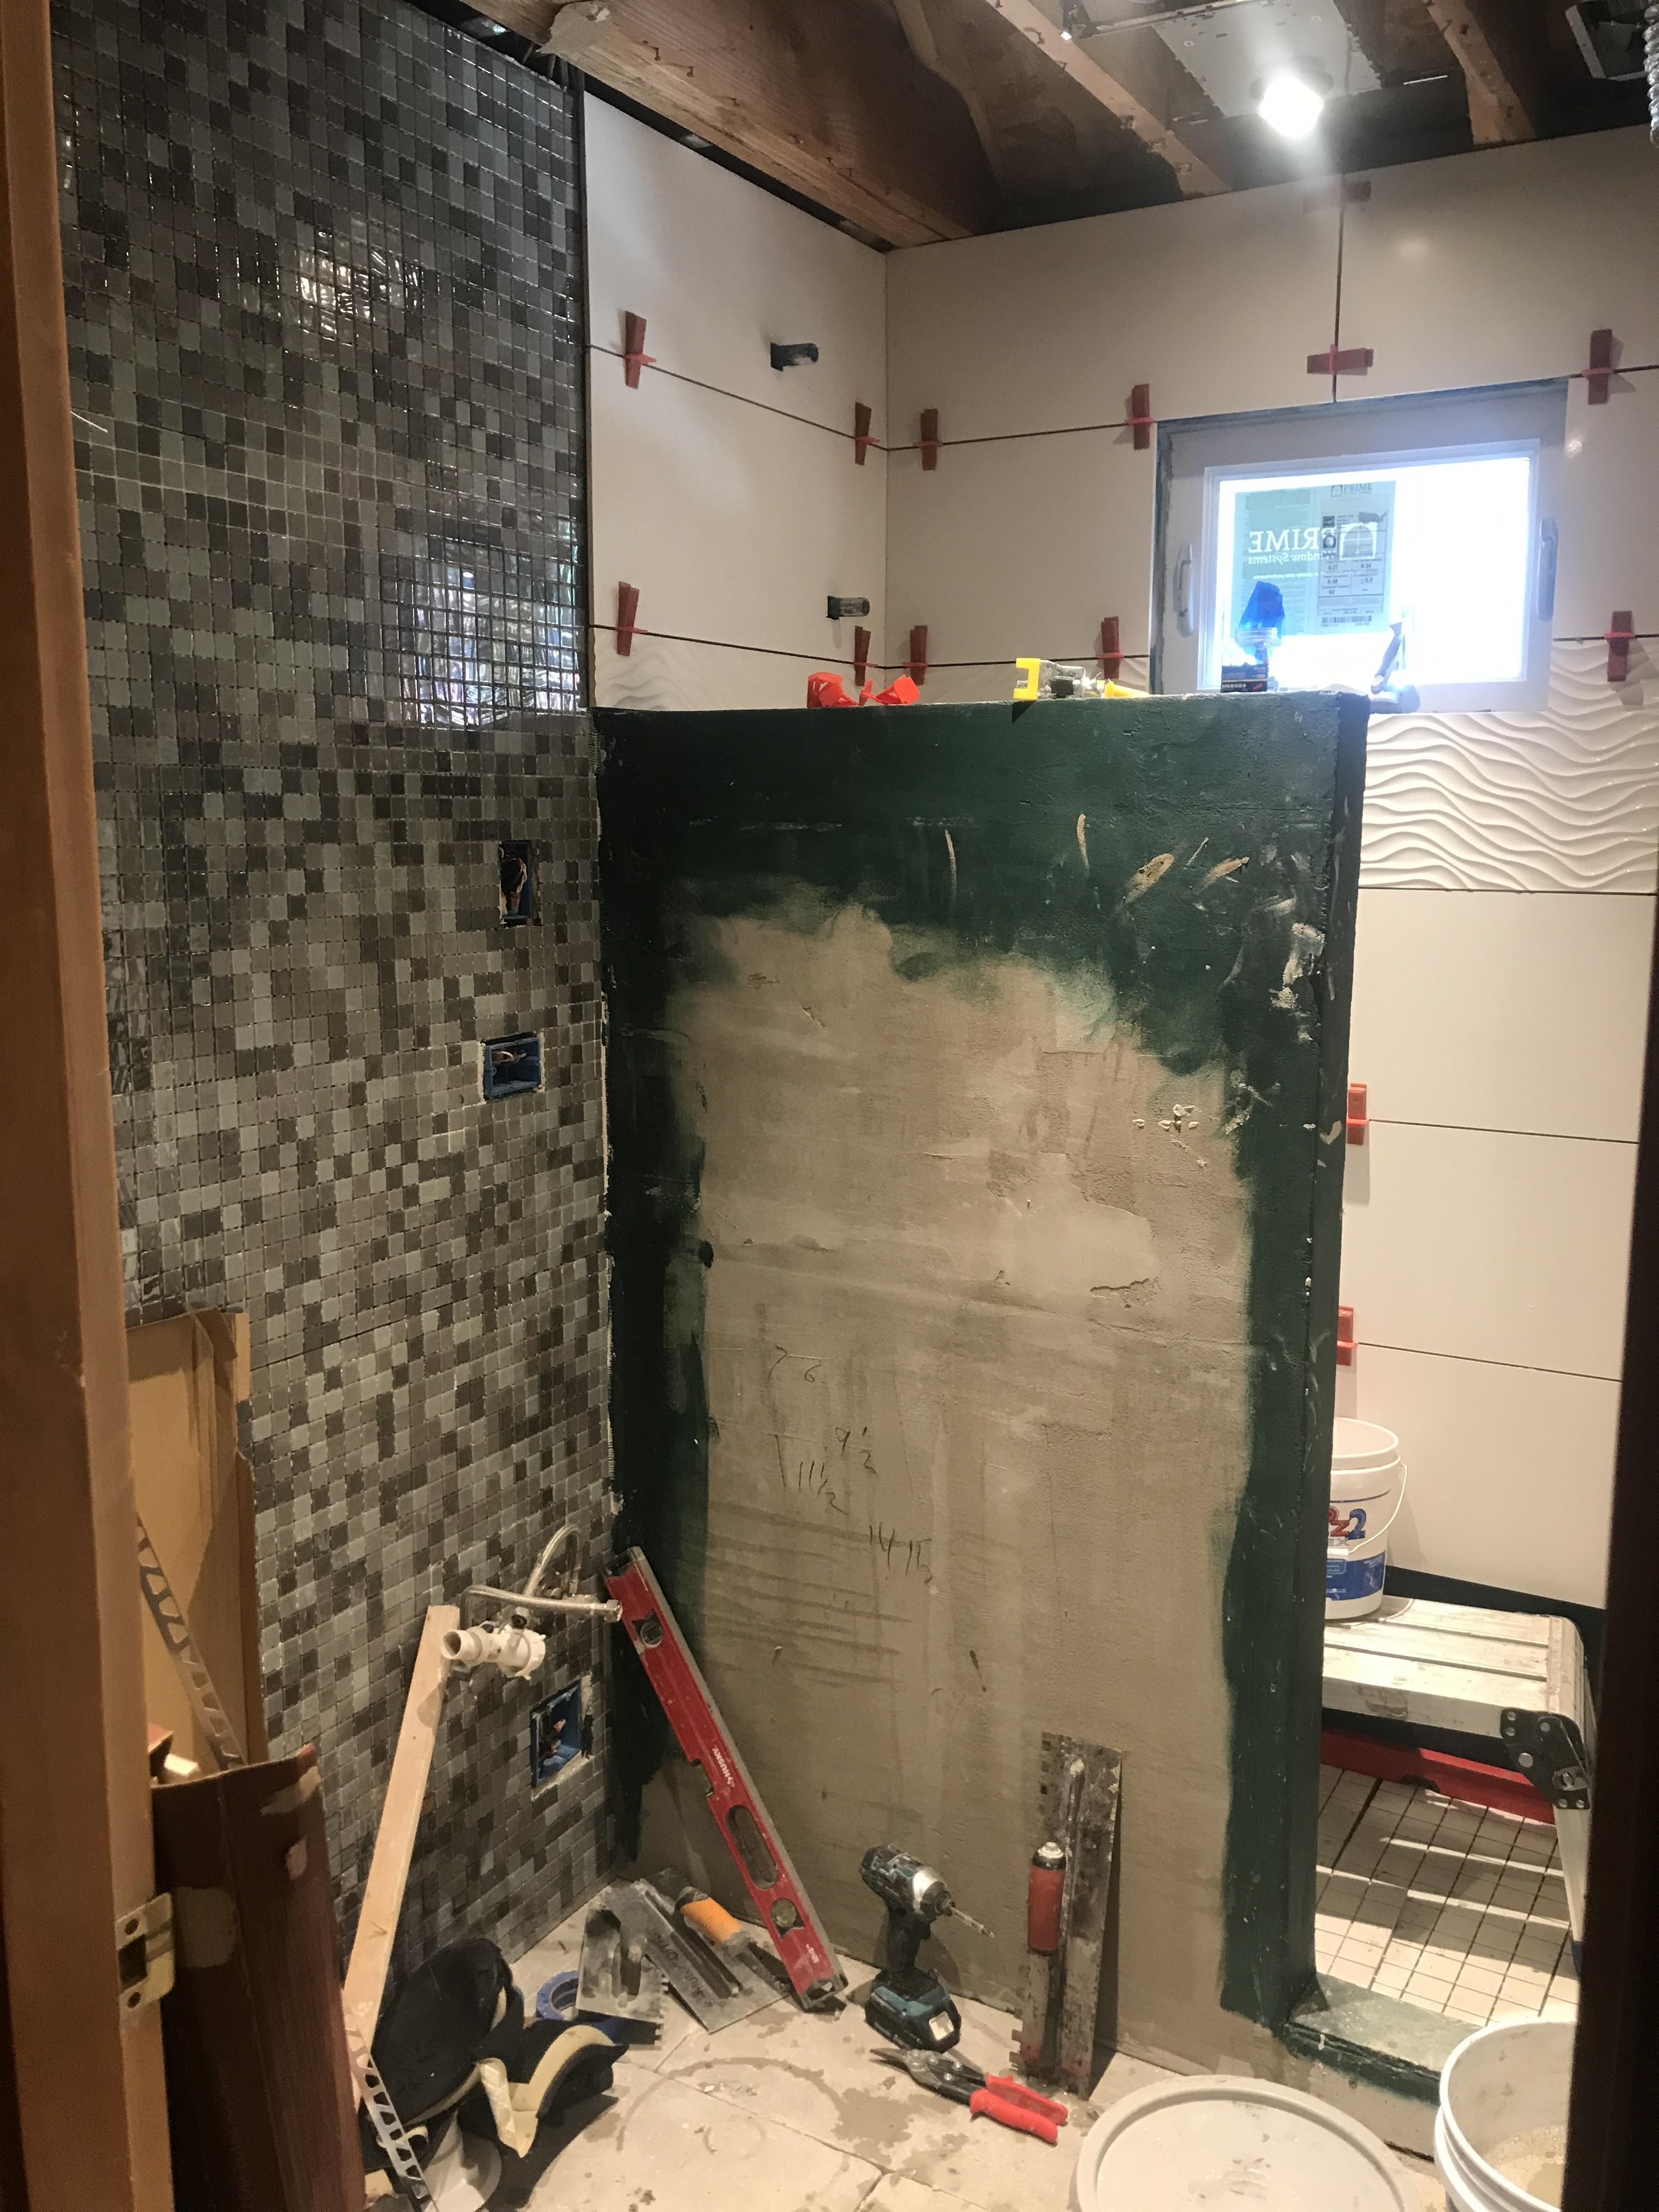 Help me out. Complete bathroom tiled.-997b54d7-cca6-4993-8b44-7bc3ef14bc07_1528155248696.jpeg